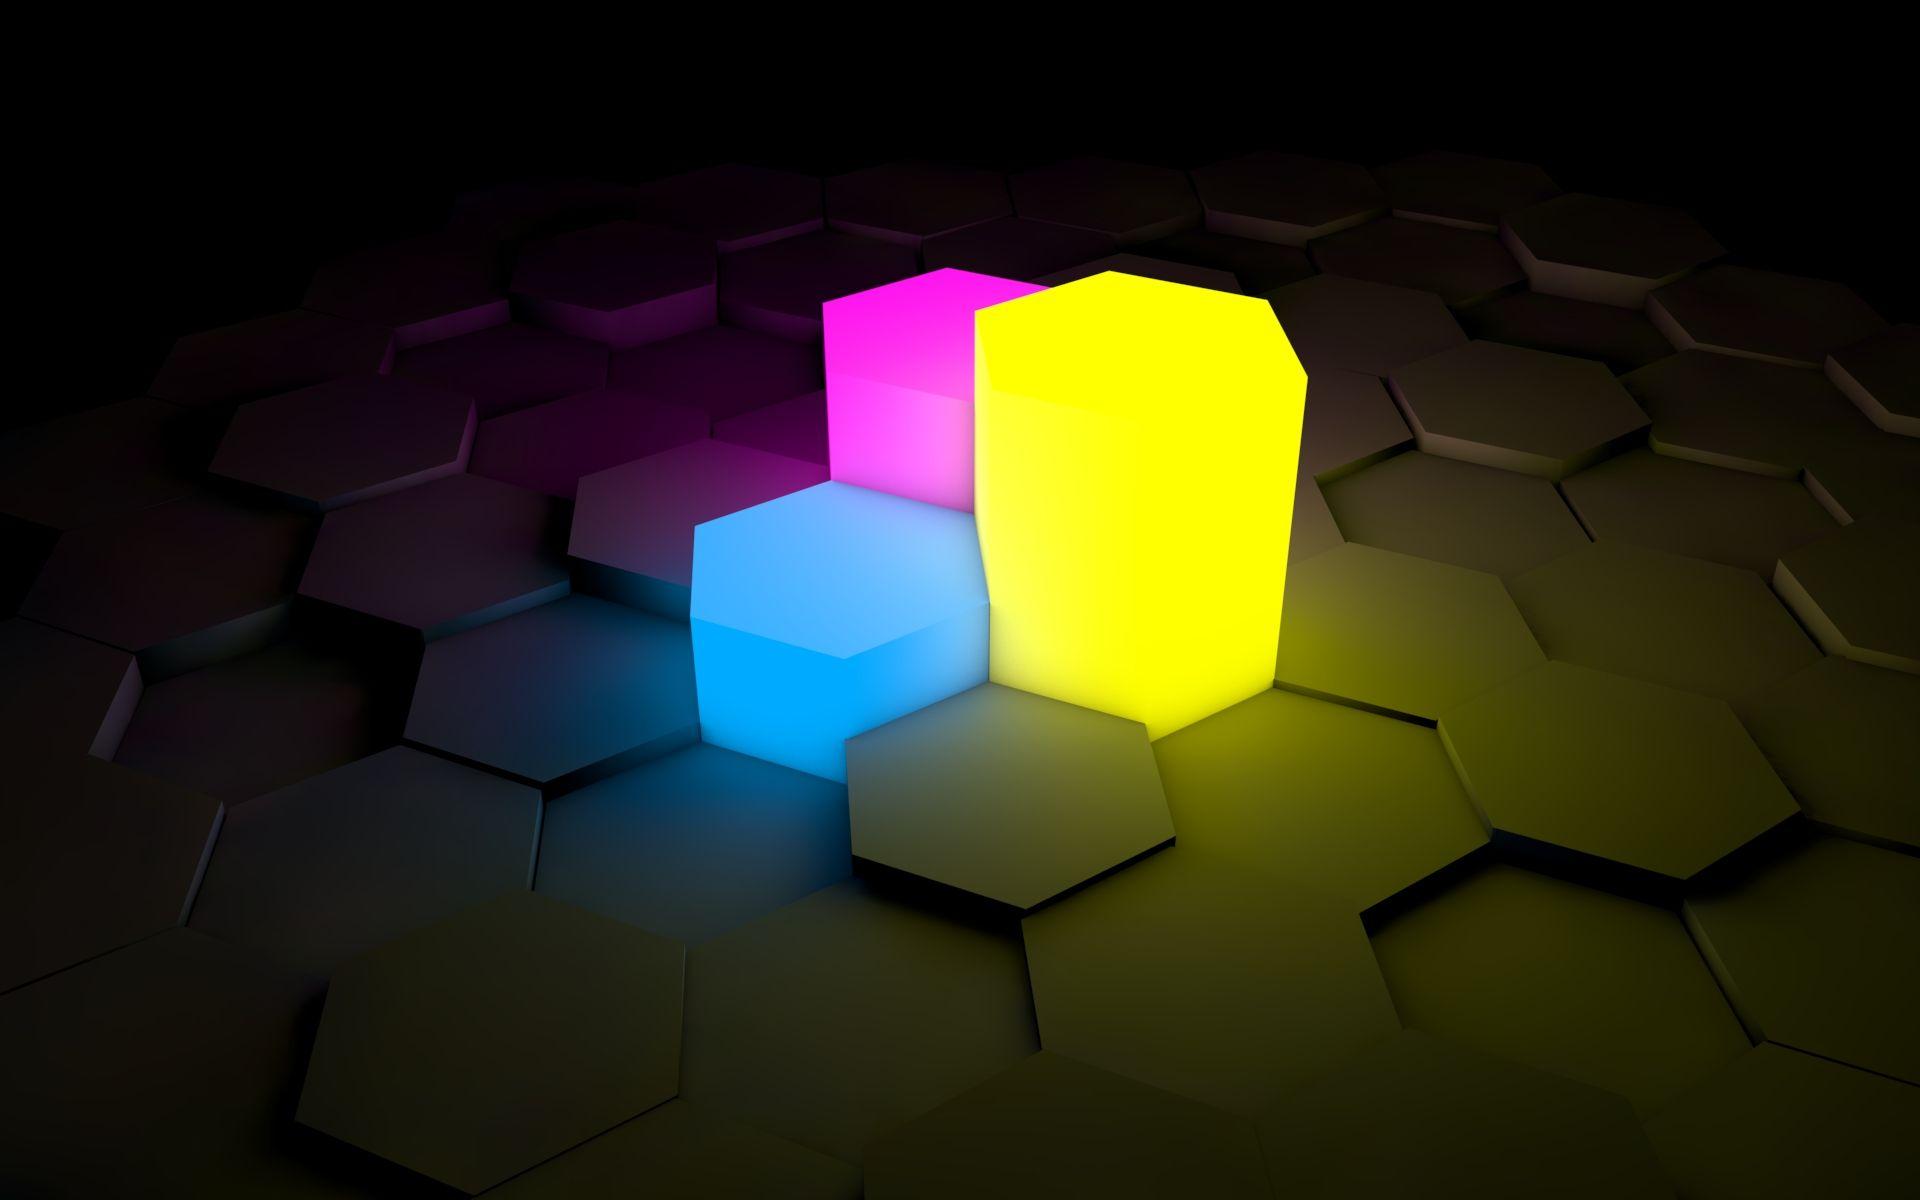 Download Wallpaper 1920x1200 Figurines Lights Neon Surface 1920x1200 Hd Background Neon Wallpaper Hexagon Wallpaper Wallpaper Pc